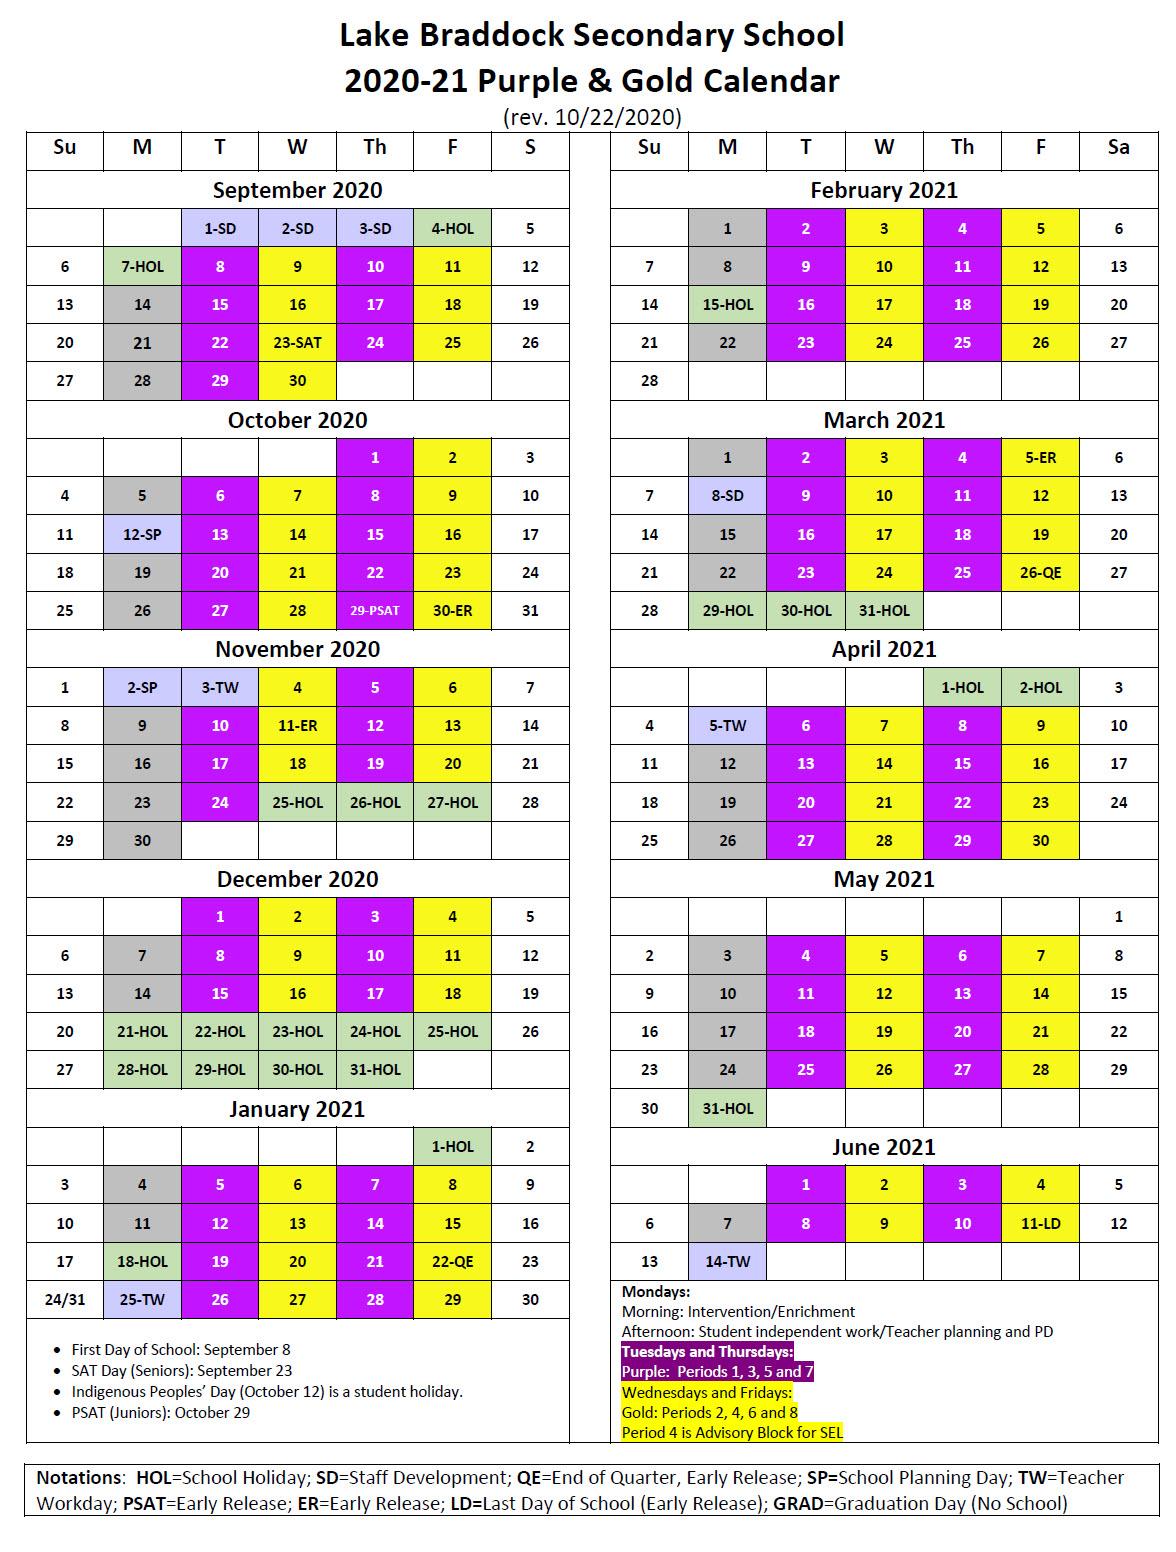 Purple and Gold Calendar | Lake Braddock Secondary School